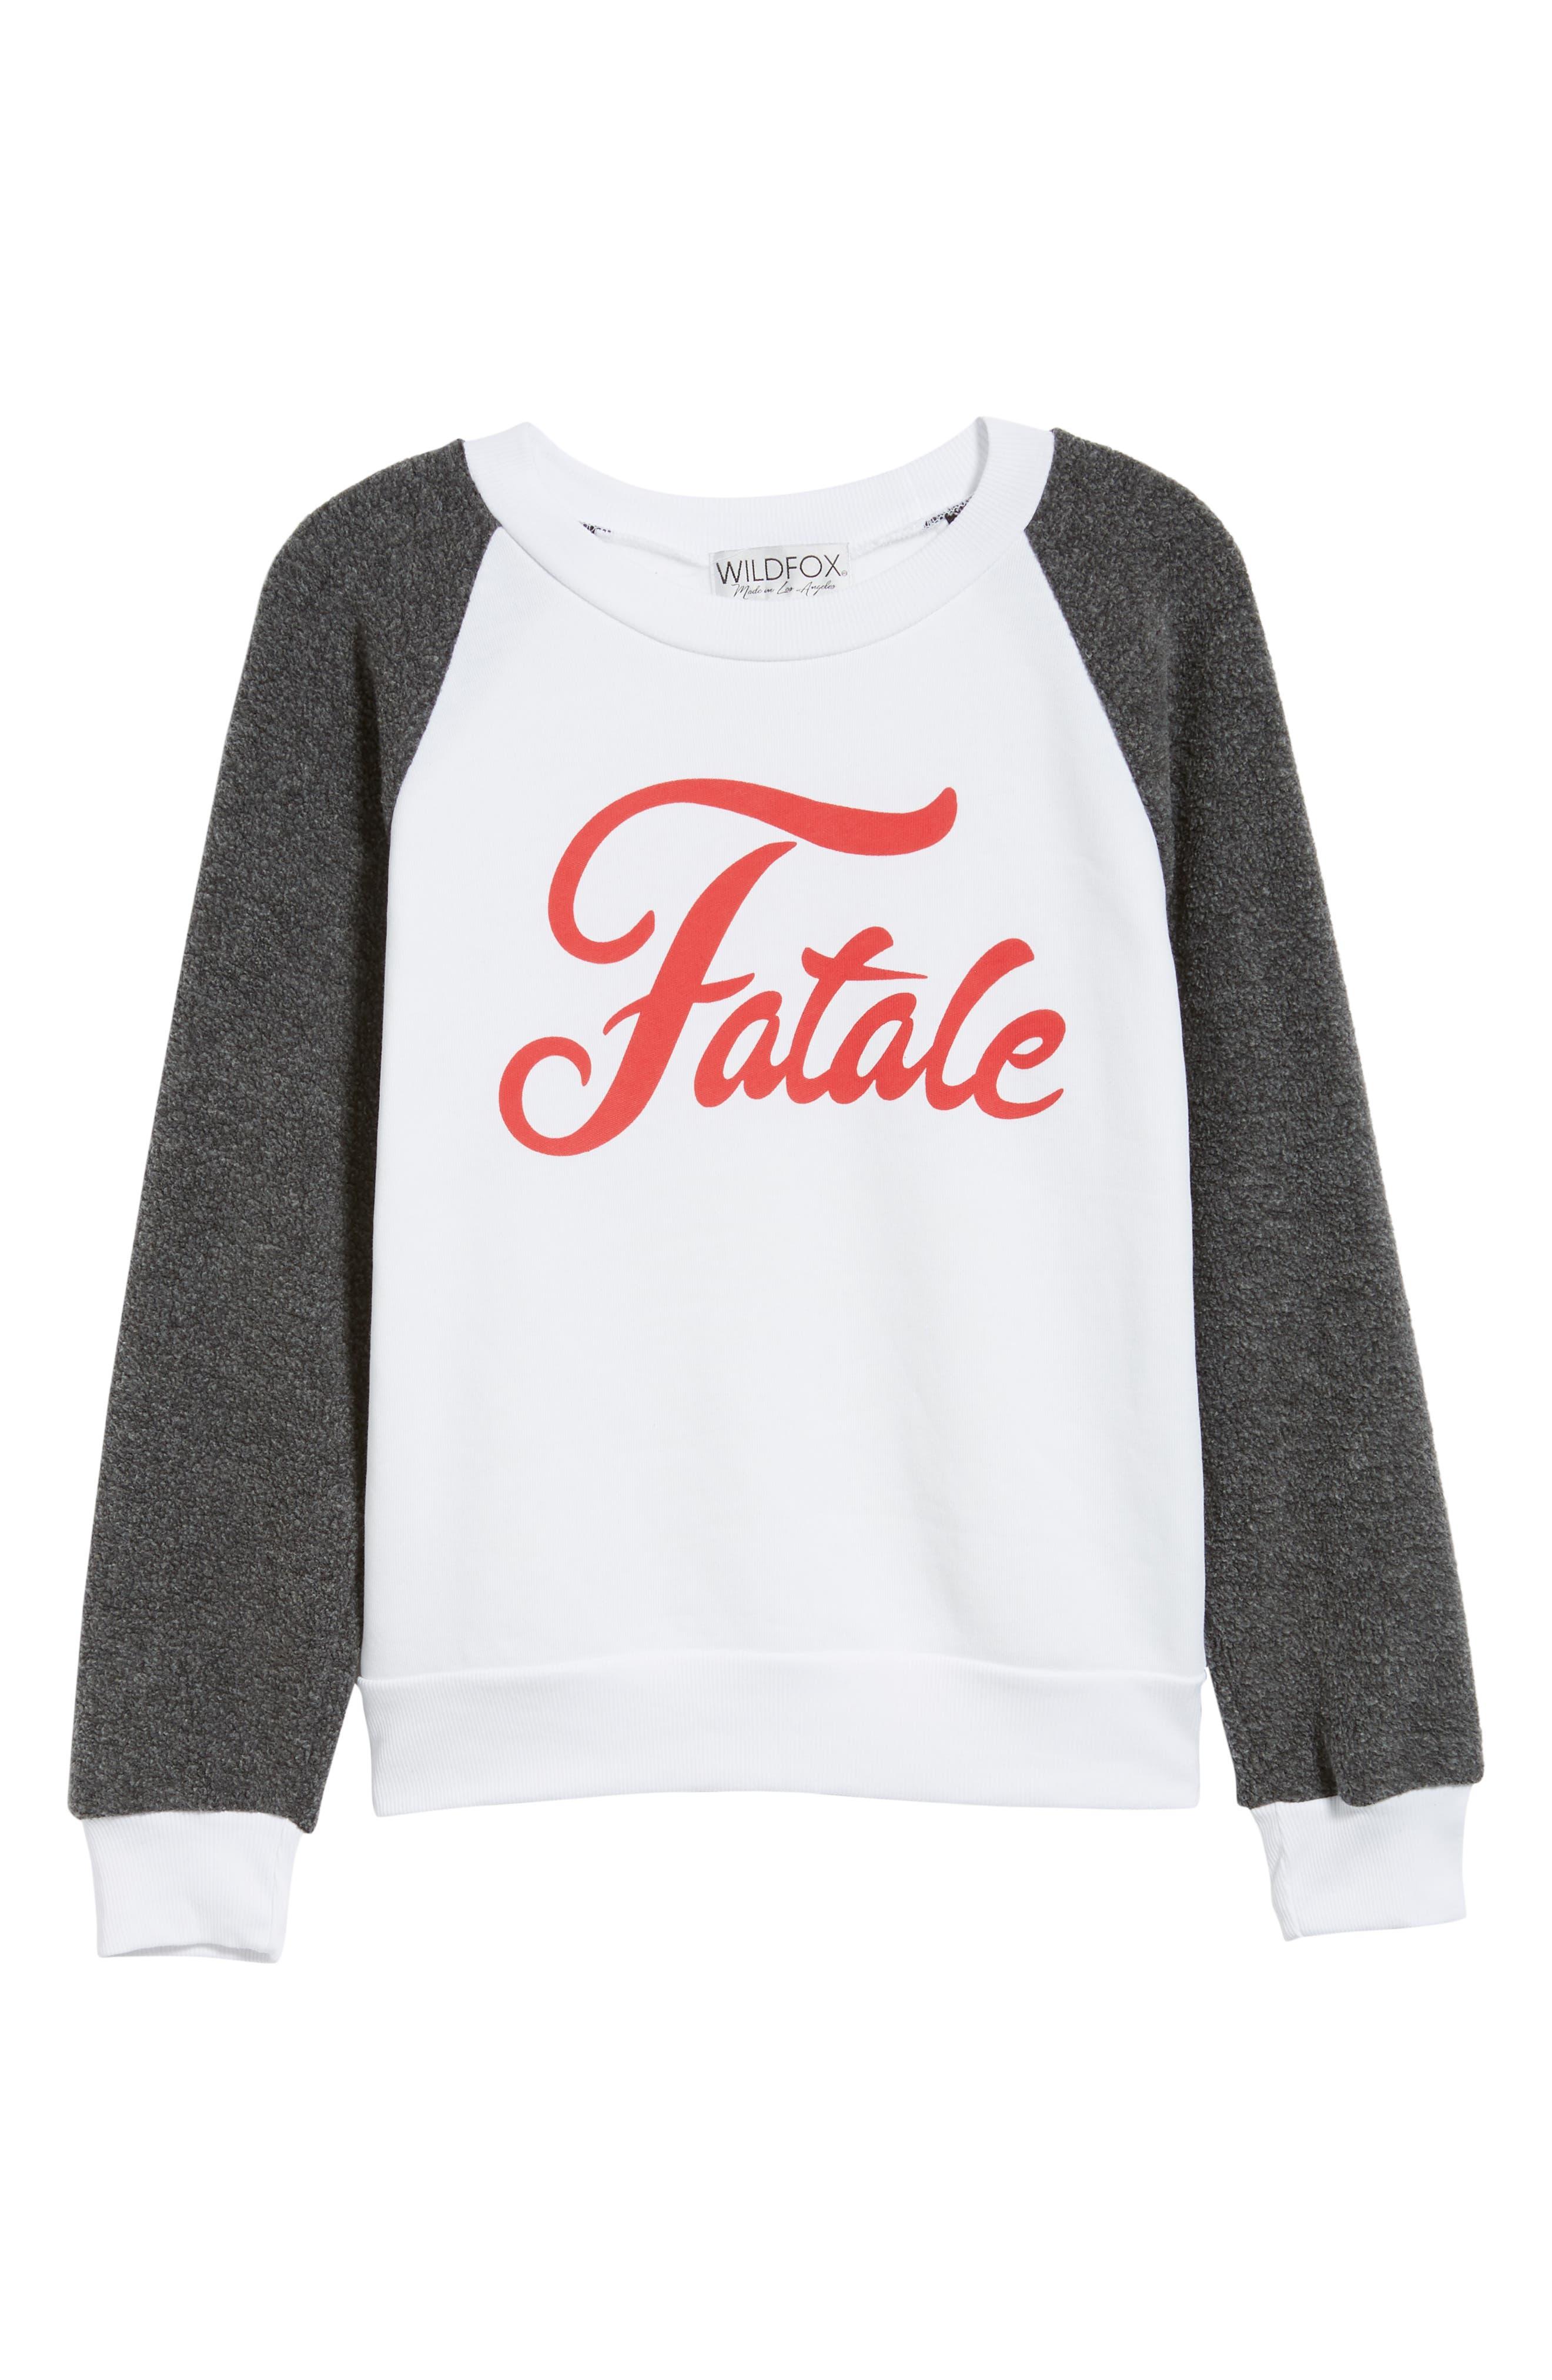 Fatale Fleece Sleeve Sweatshirt,                             Alternate thumbnail 6, color,                             CLEAN WHITE/ CLEAN BLACK